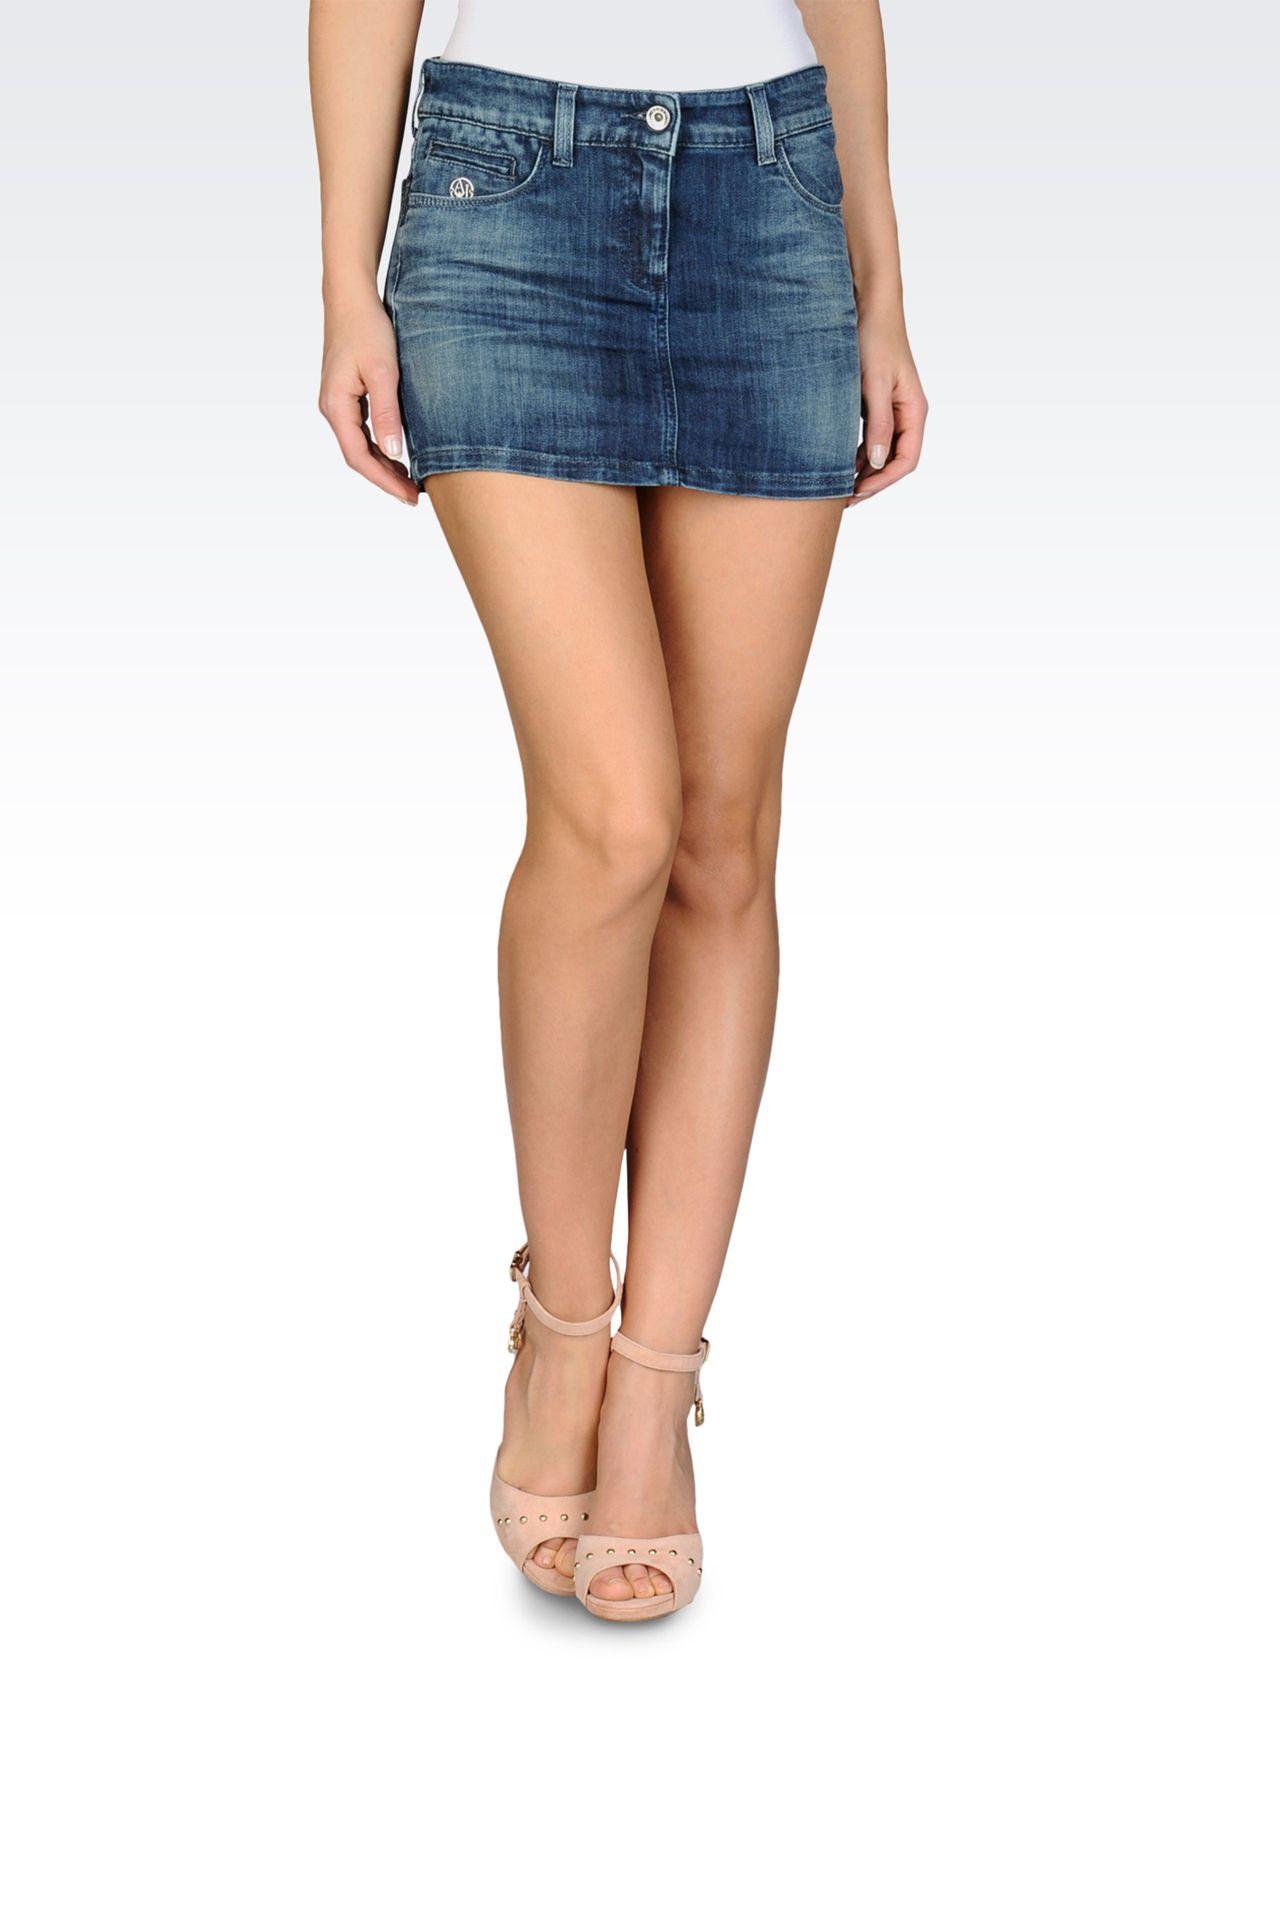 MINISKIRT IN VINTAGE BLUE STRETCH DENIM: Denim skirts Women by Armani - 0